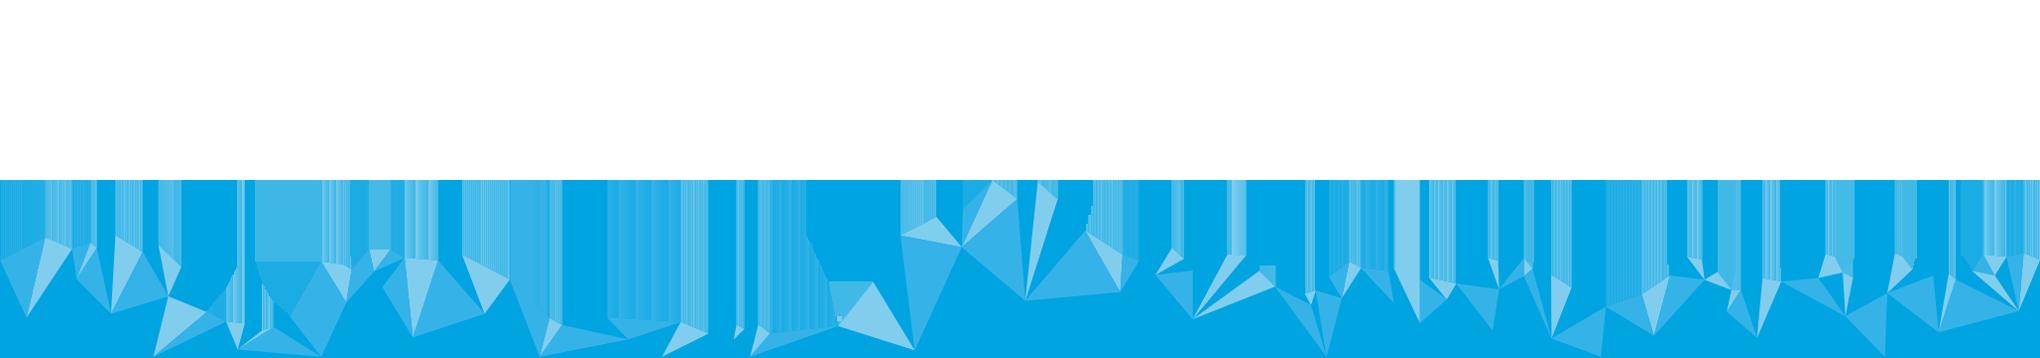 Stoneman Miriquidi Road Rennrad Erzgebirge Höhenprofil